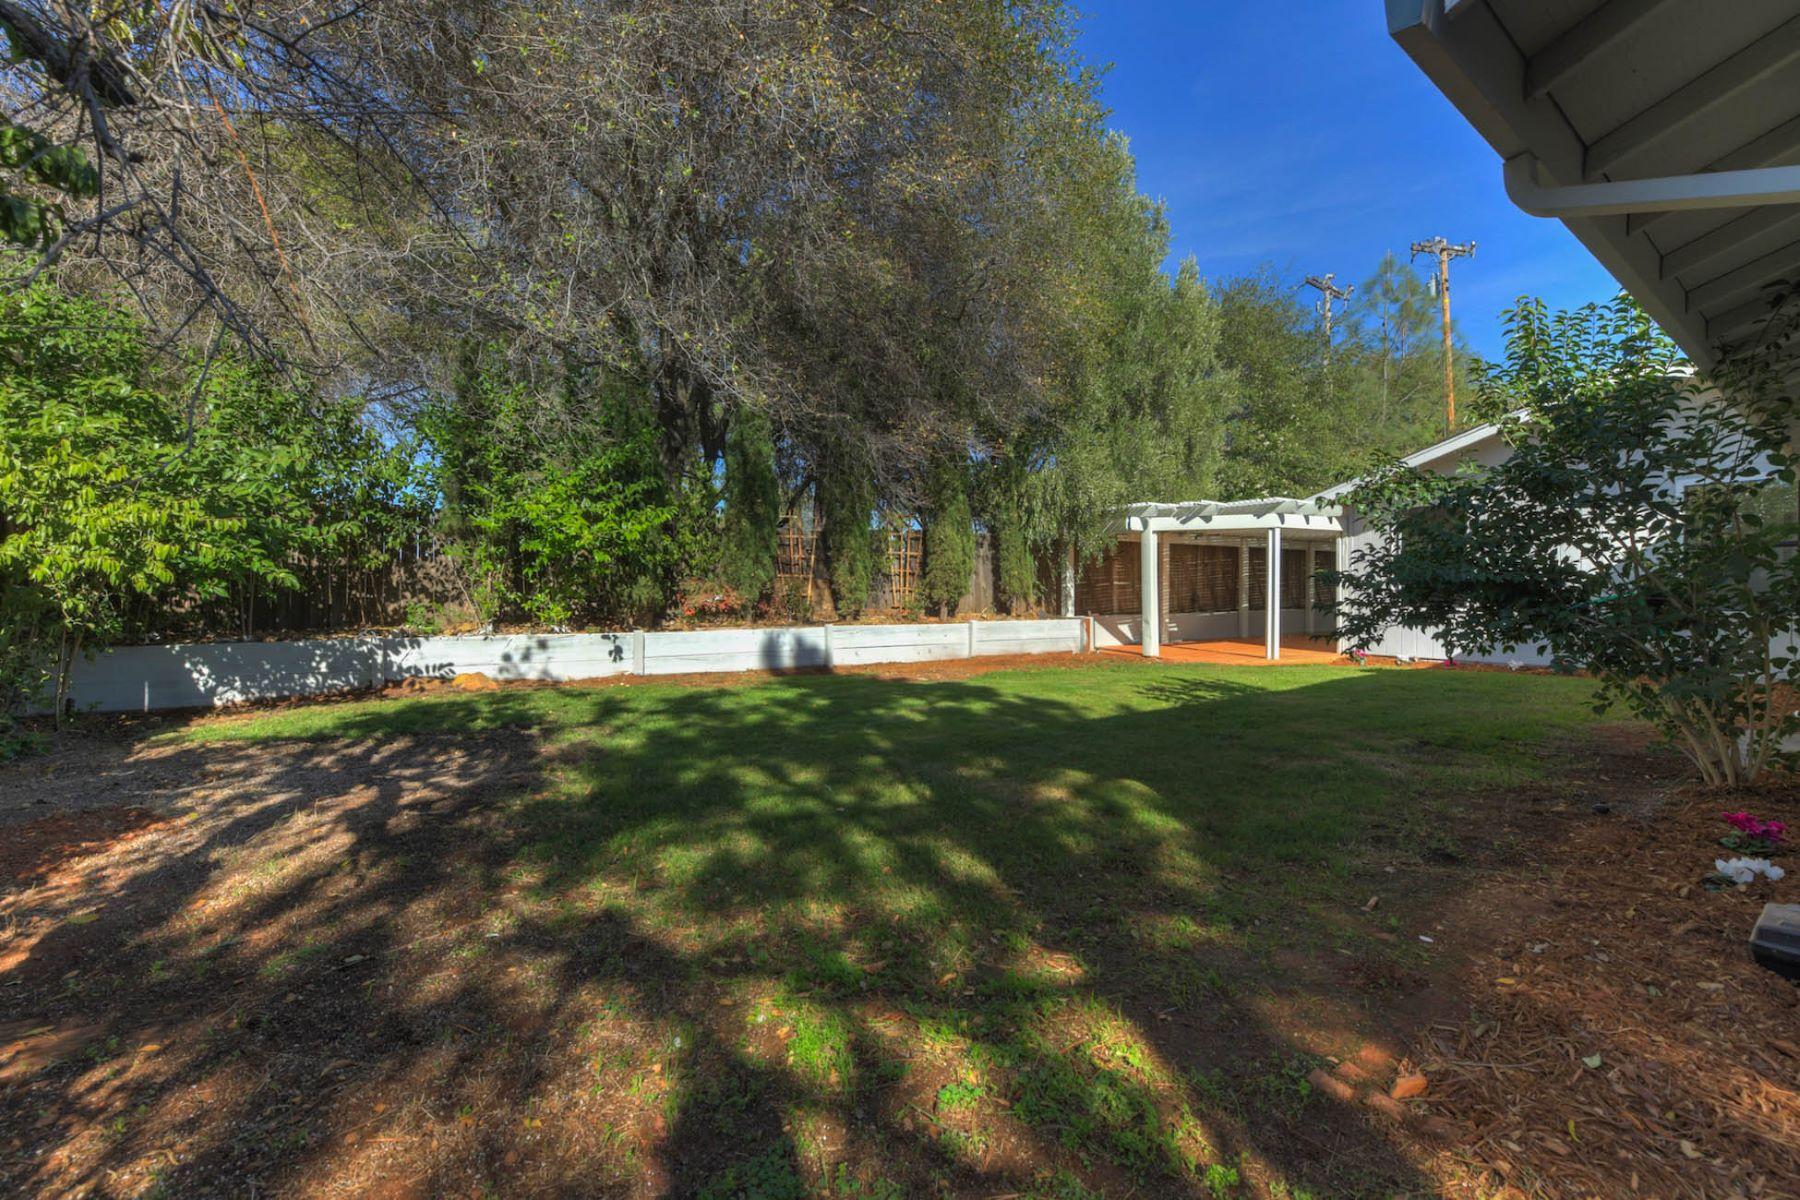 Additional photo for property listing at 1095 Matson Dr,Auburn, CA  95603 1095 Matson Dr Auburn, California 95603 United States